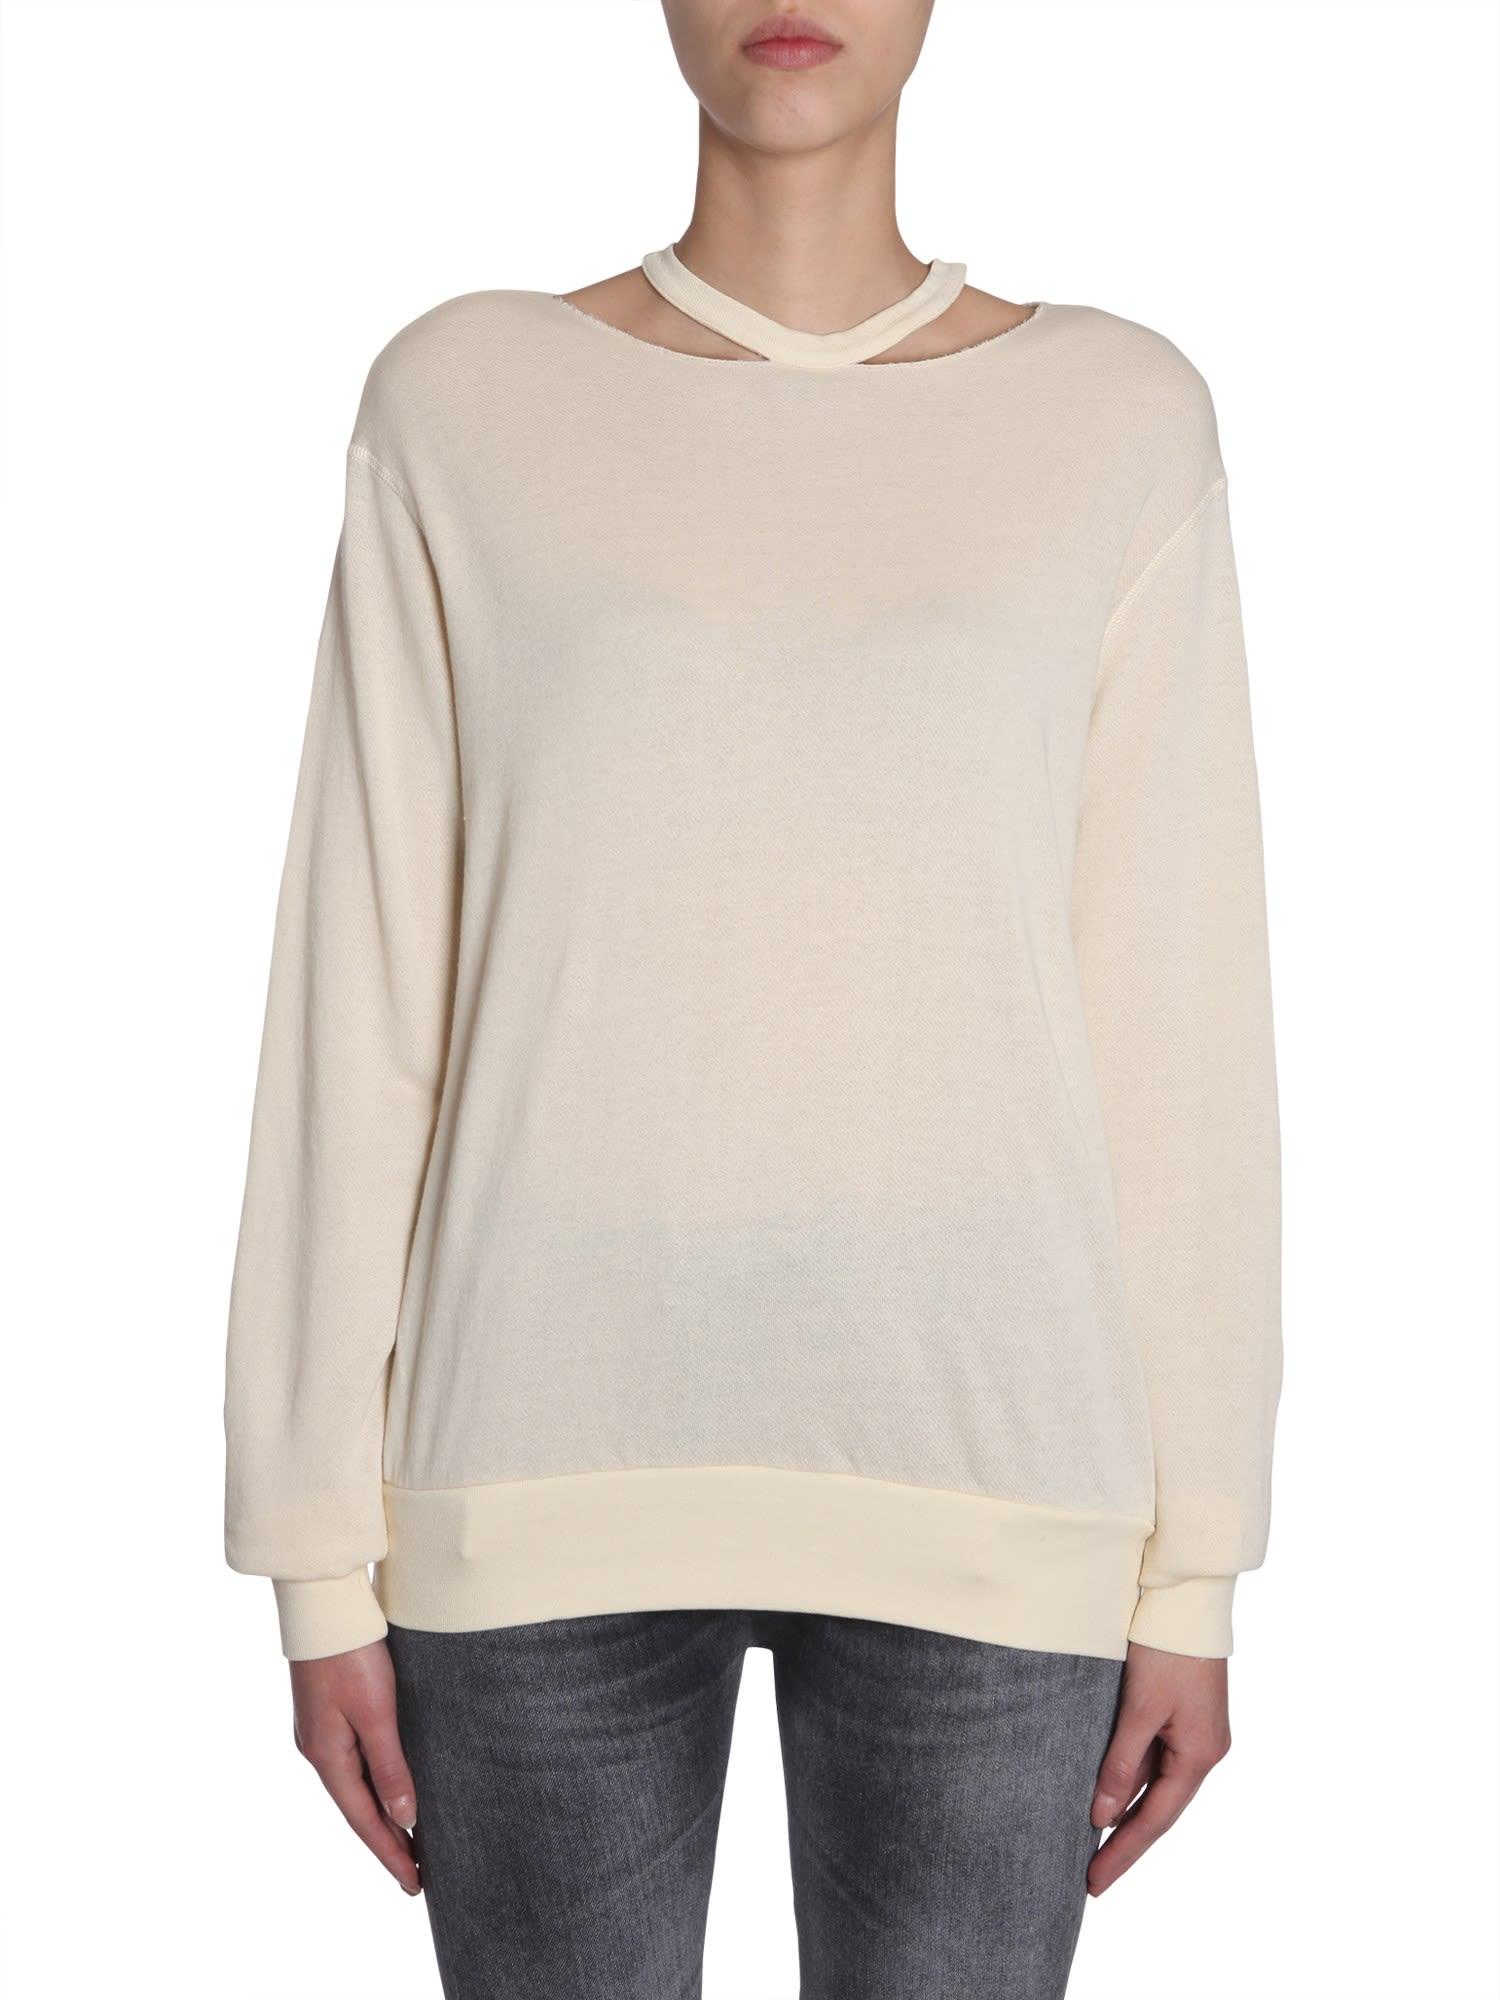 Cut Out Round Collar Sweatshirt